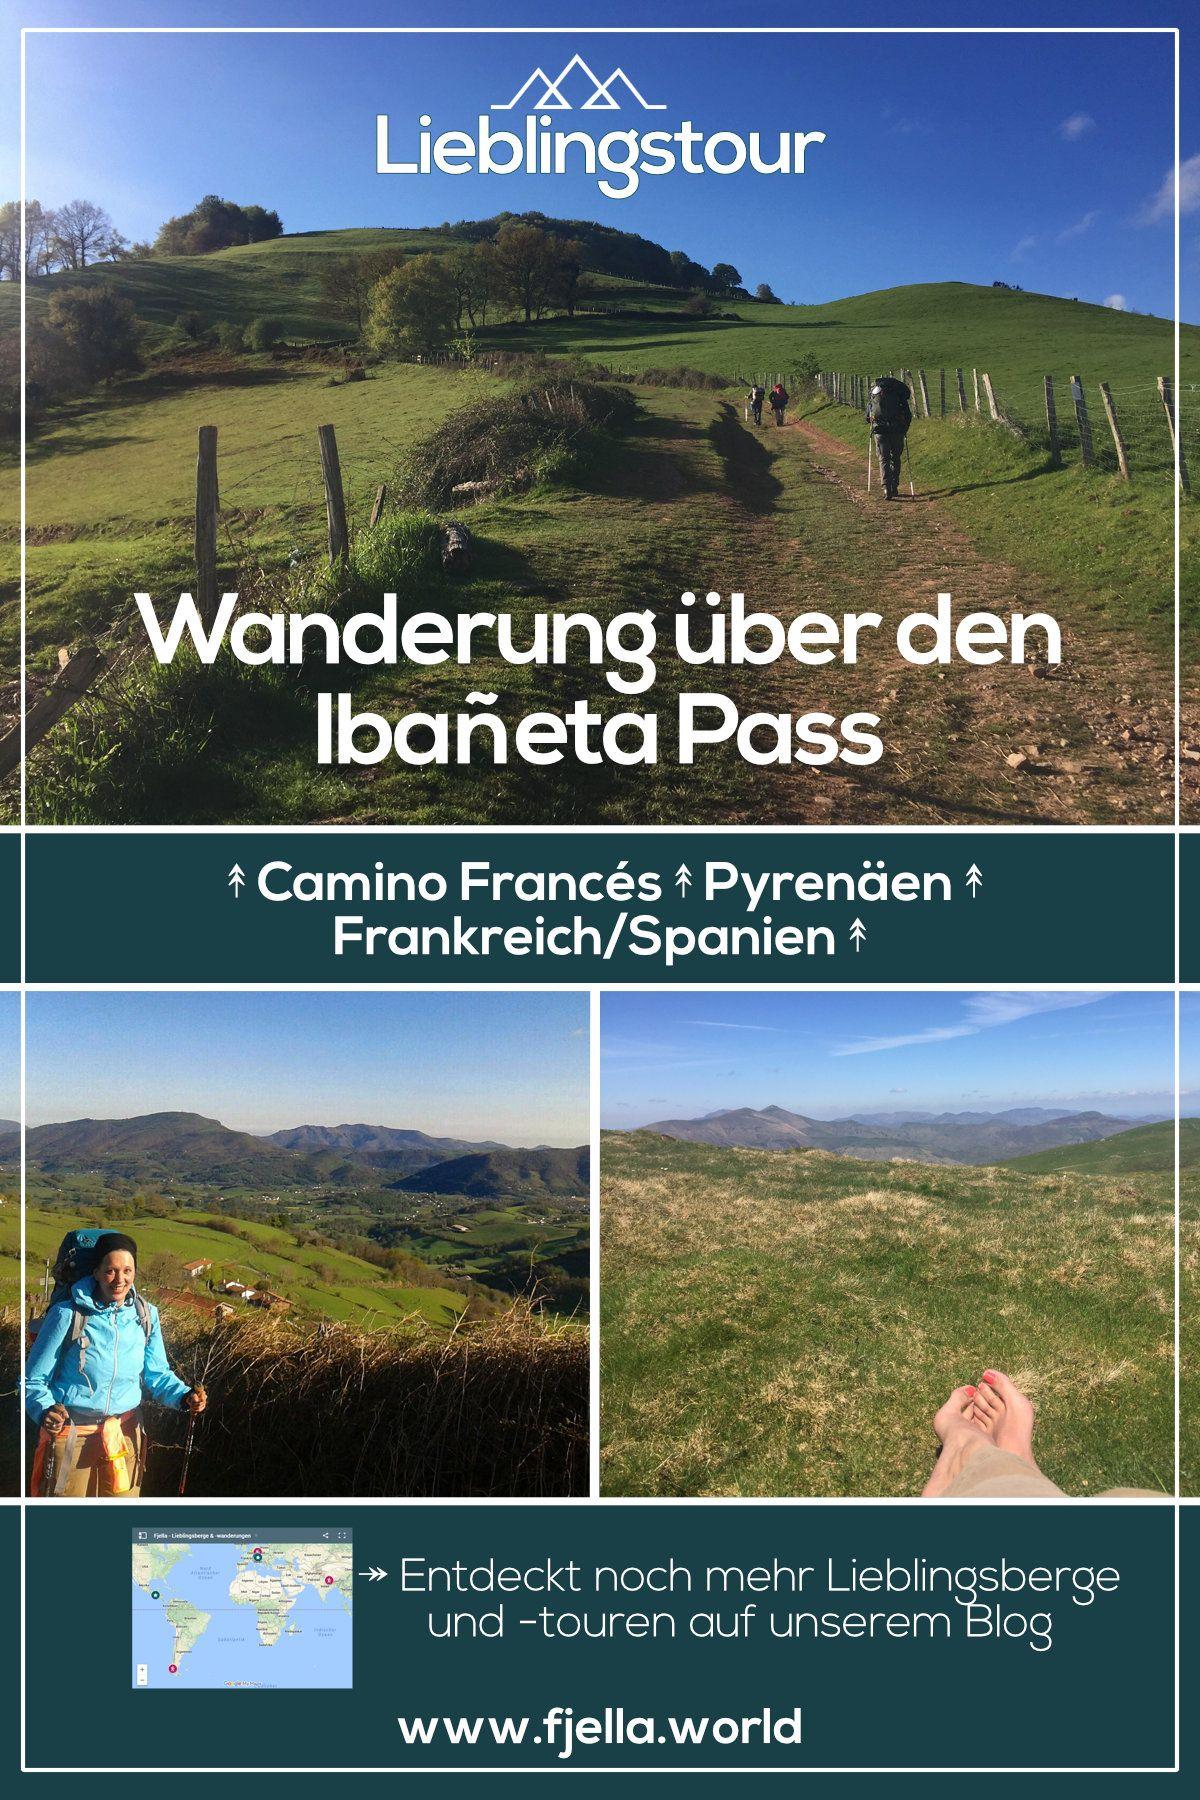 Wanderung Uber Den Ibaneta Pass Auf Dem Camino Frances Pyrenaen Wanderung Pyrenaen Jakobsweg Spanien